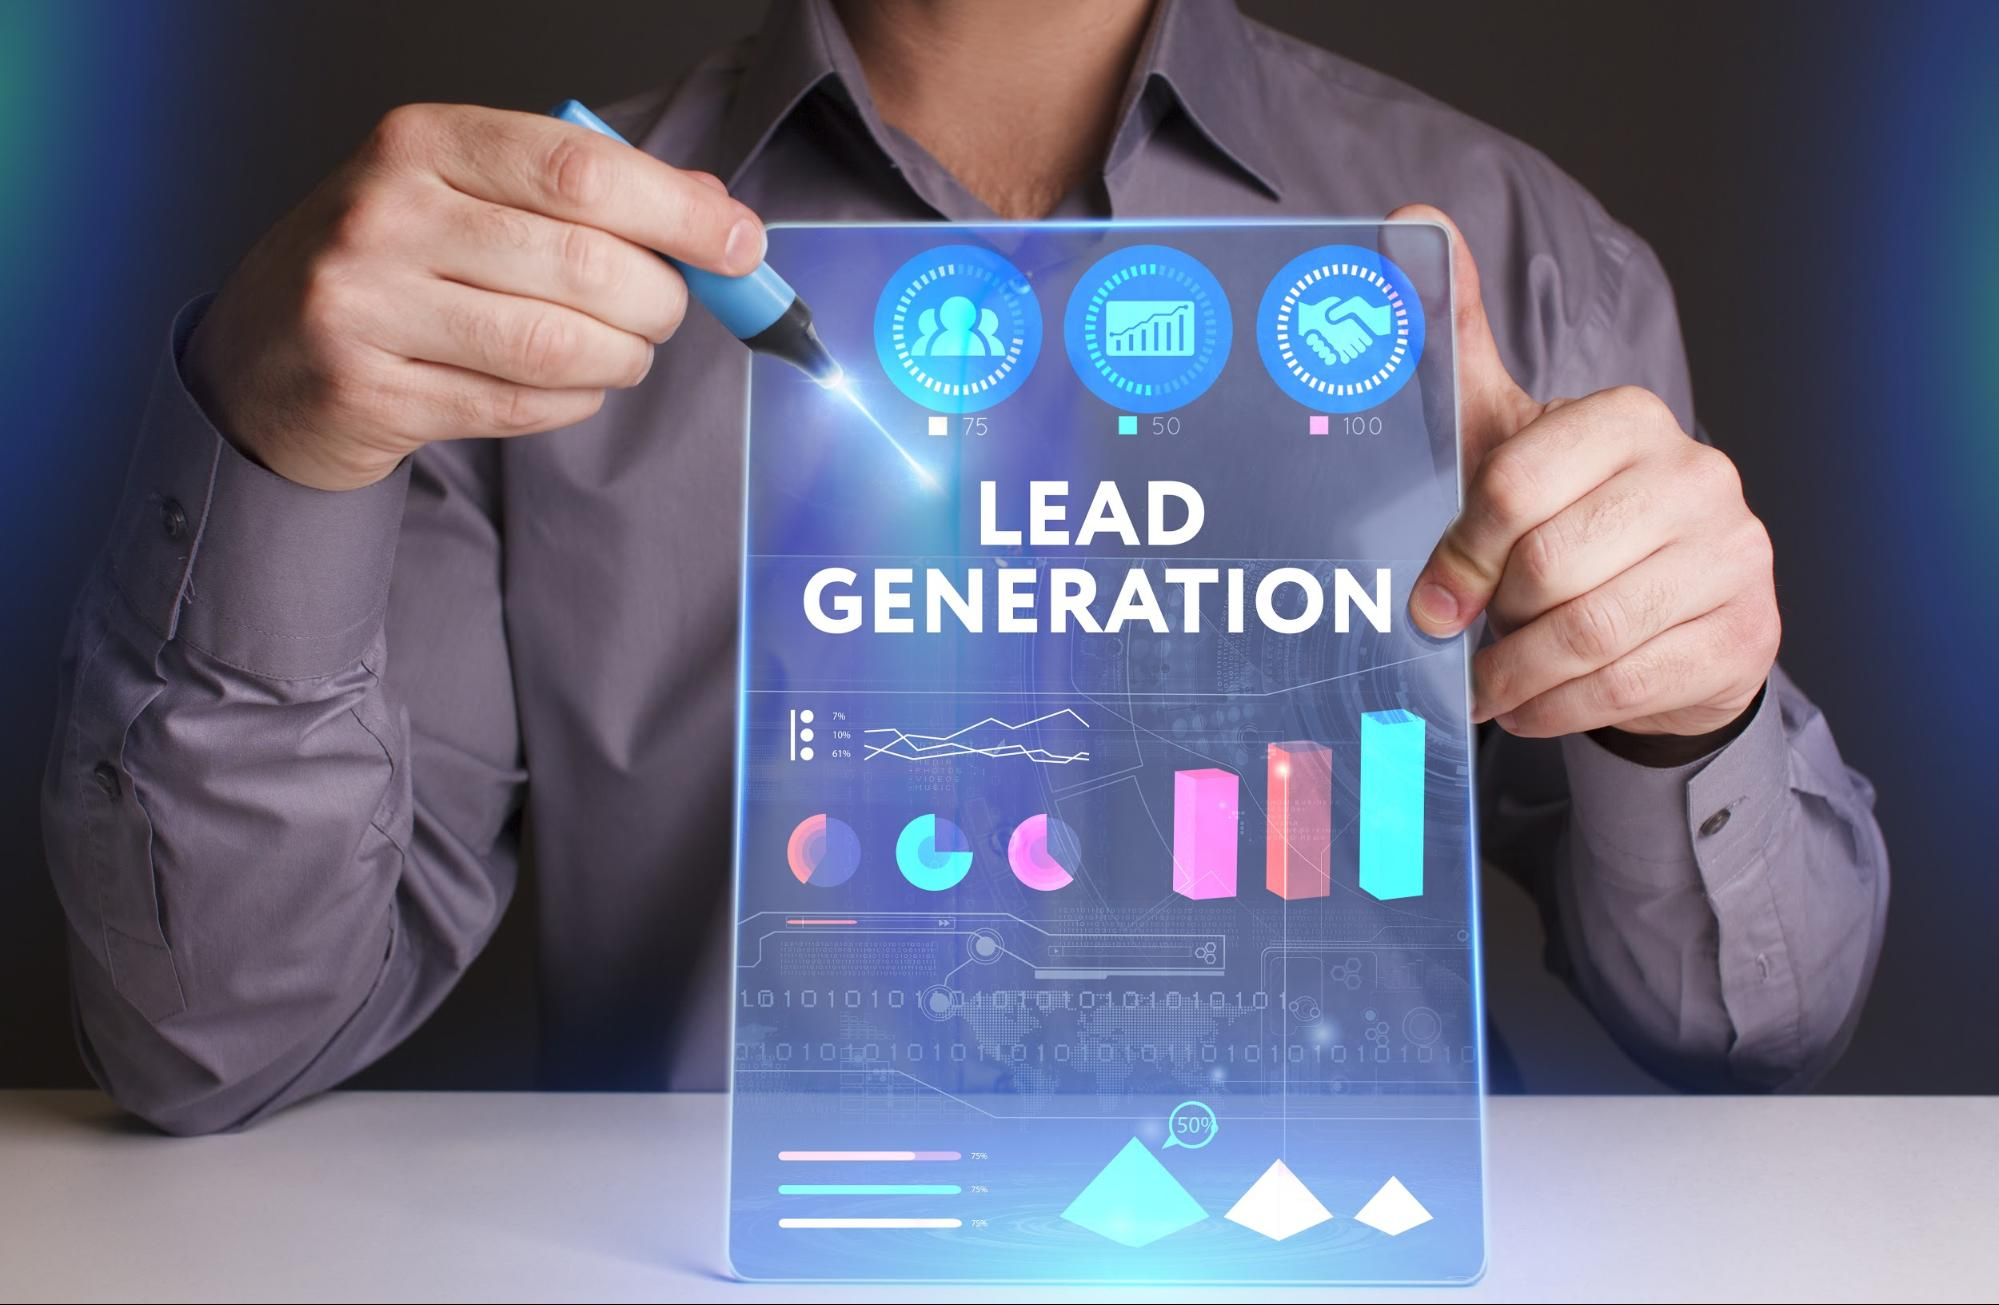 lead generation statistics